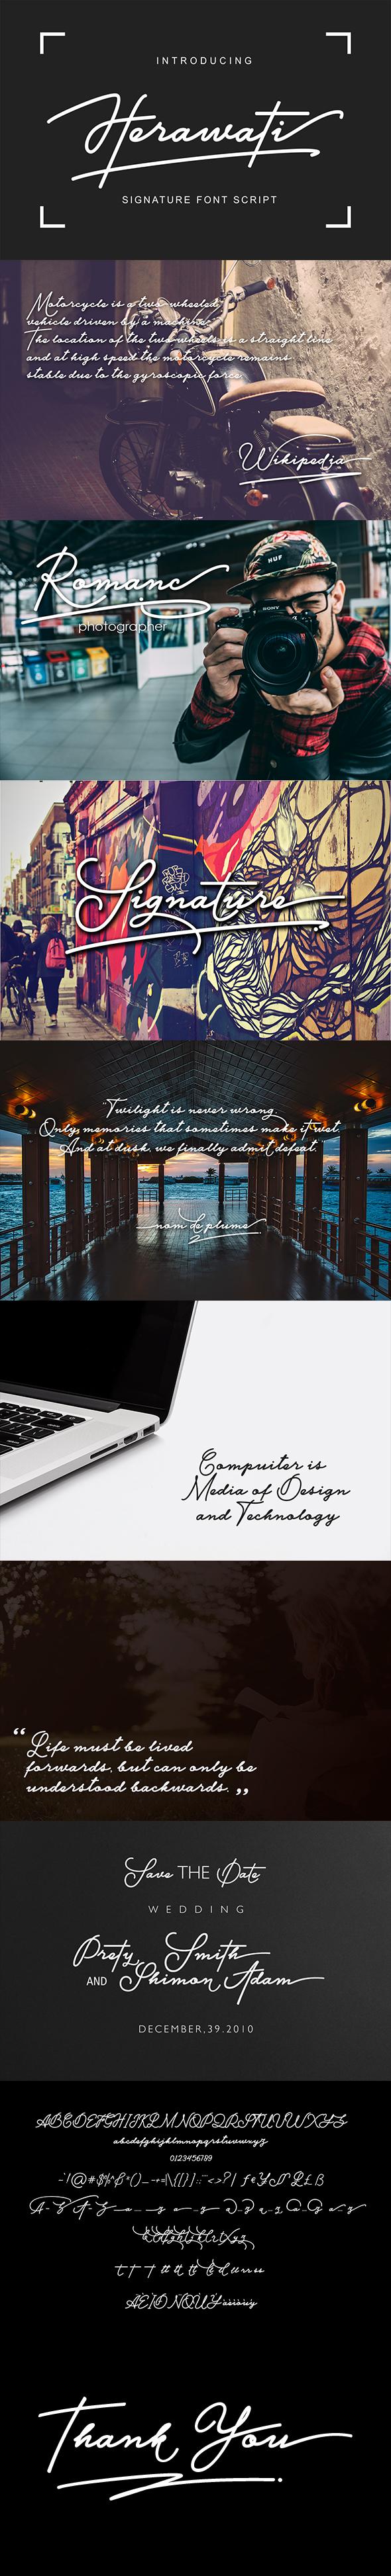 GraphicRiver Herawati Signature Script Font 21029678